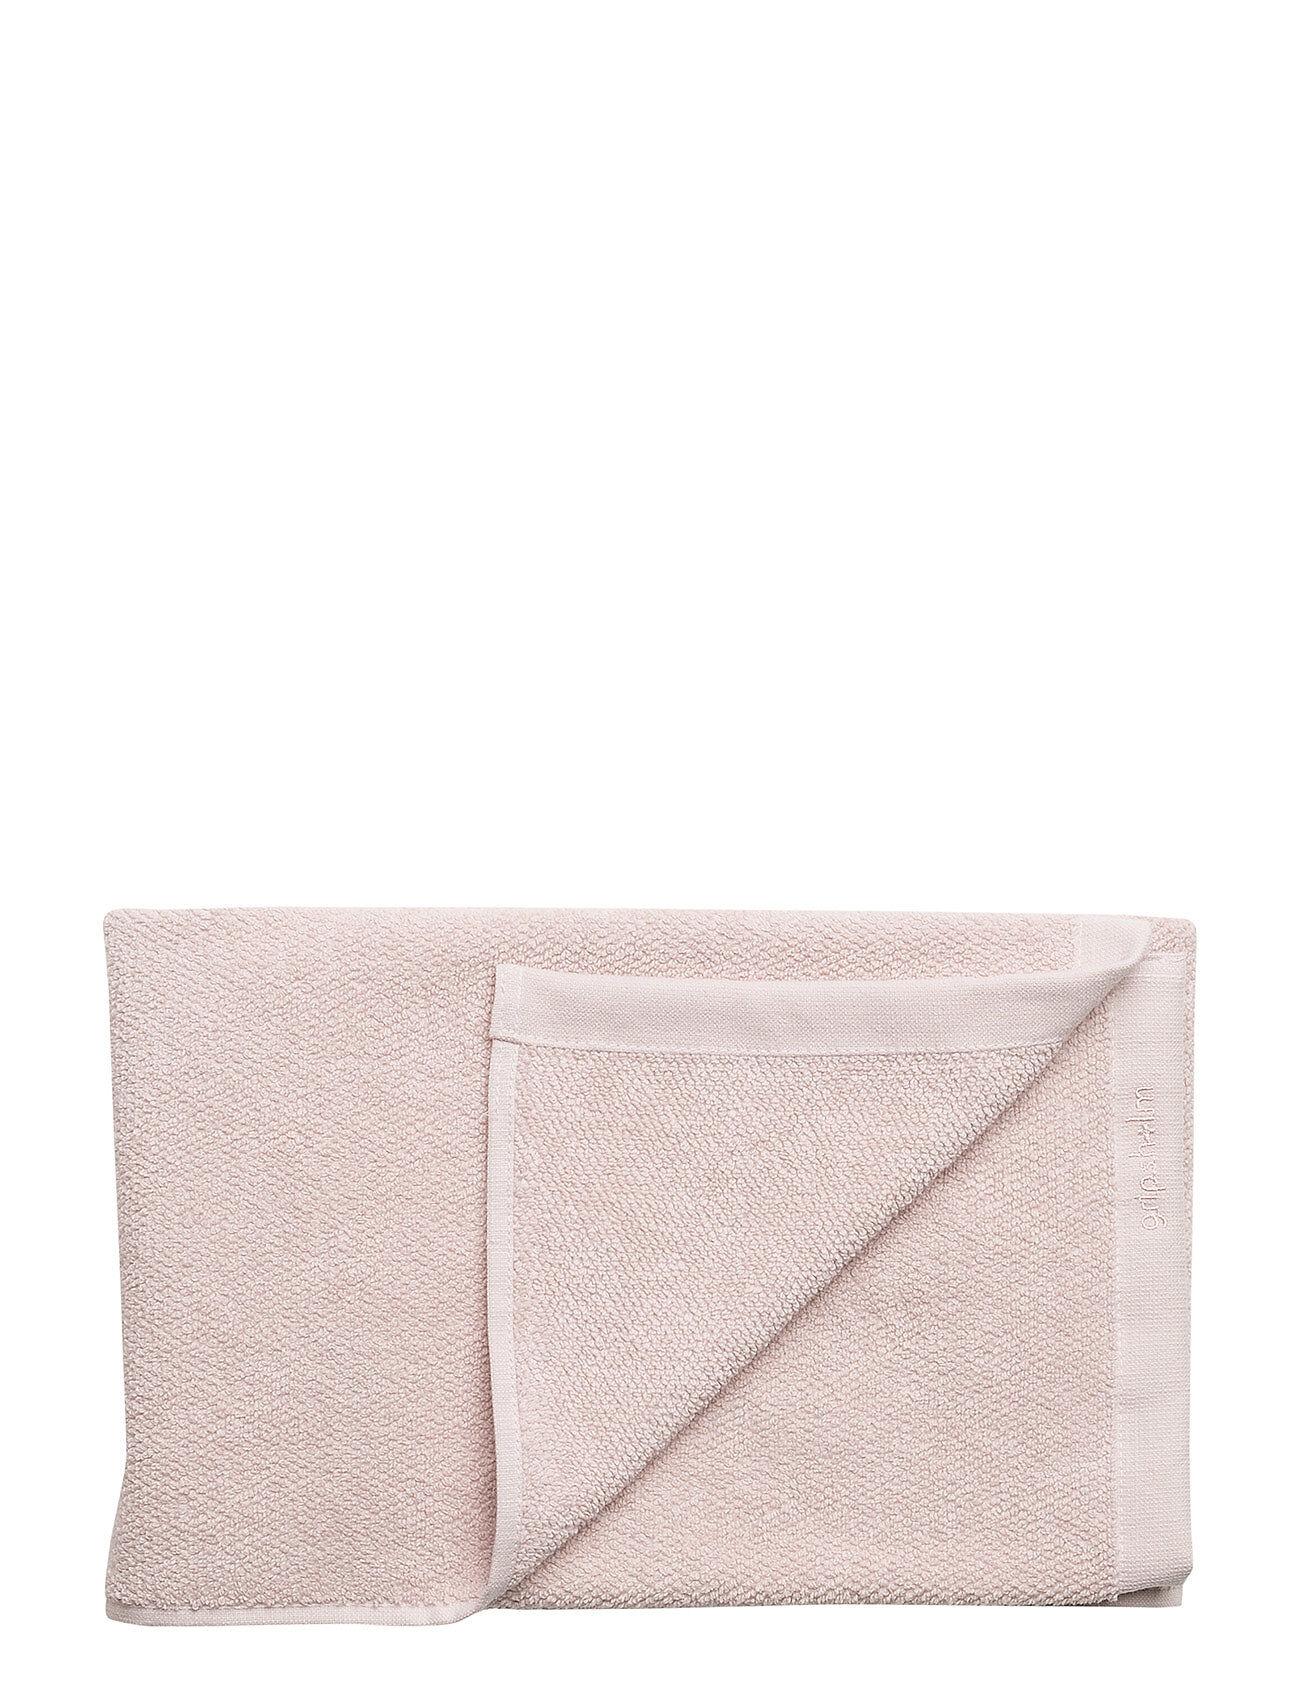 Gripsholm Bath Towel Cotton Linen Home Bathroom Towels Harmaa Gripsholm